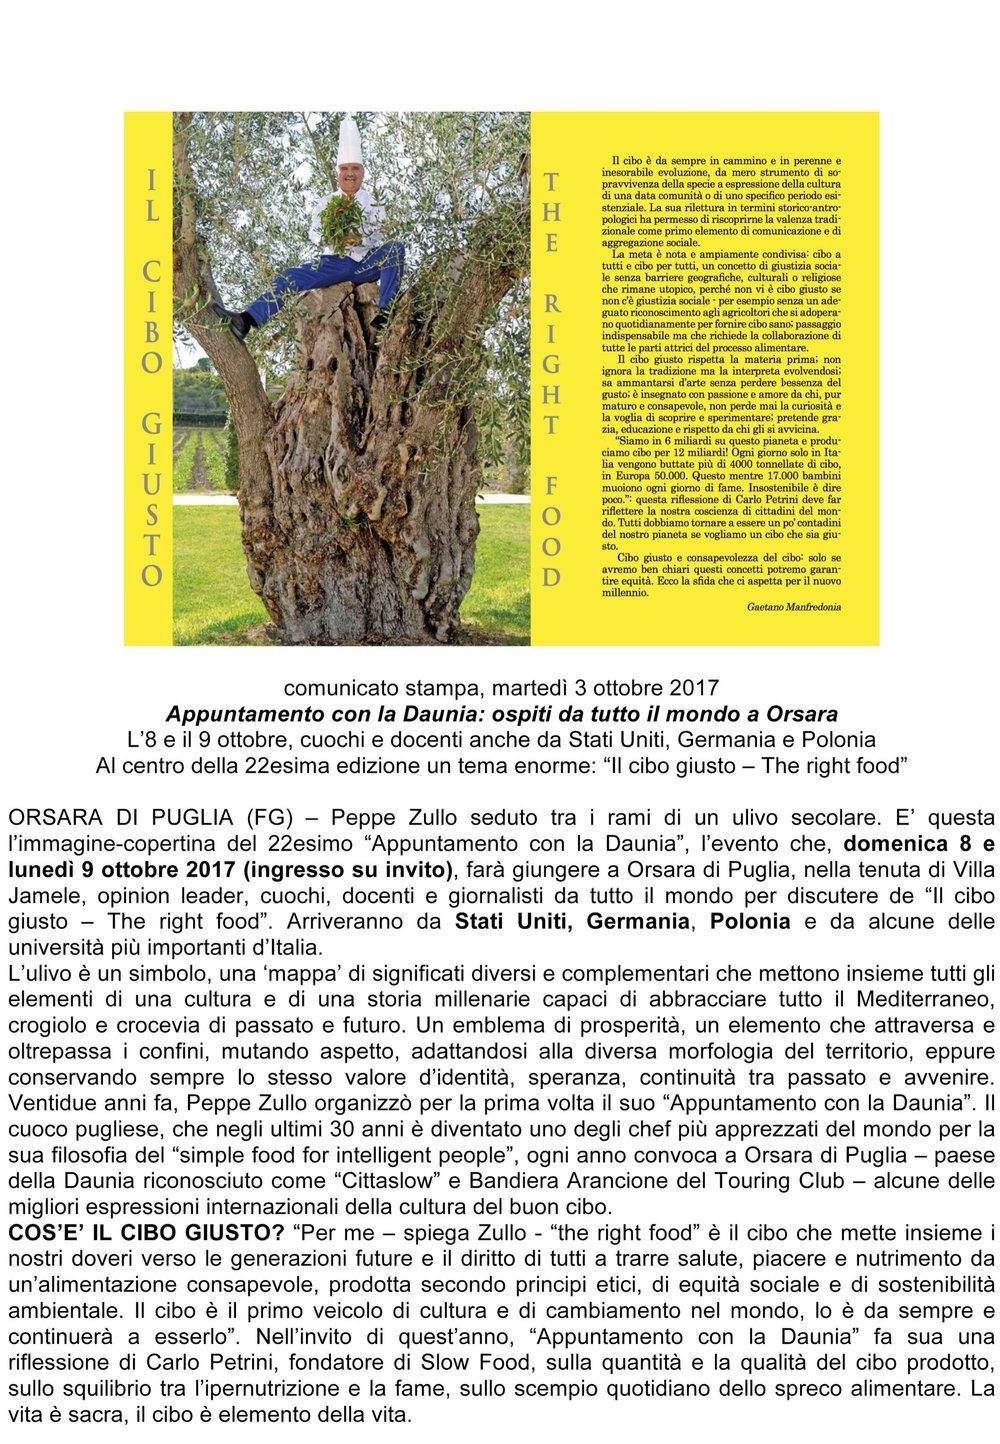 comunicato stampa Peppe Zullo whatsapp 1-1.jpg